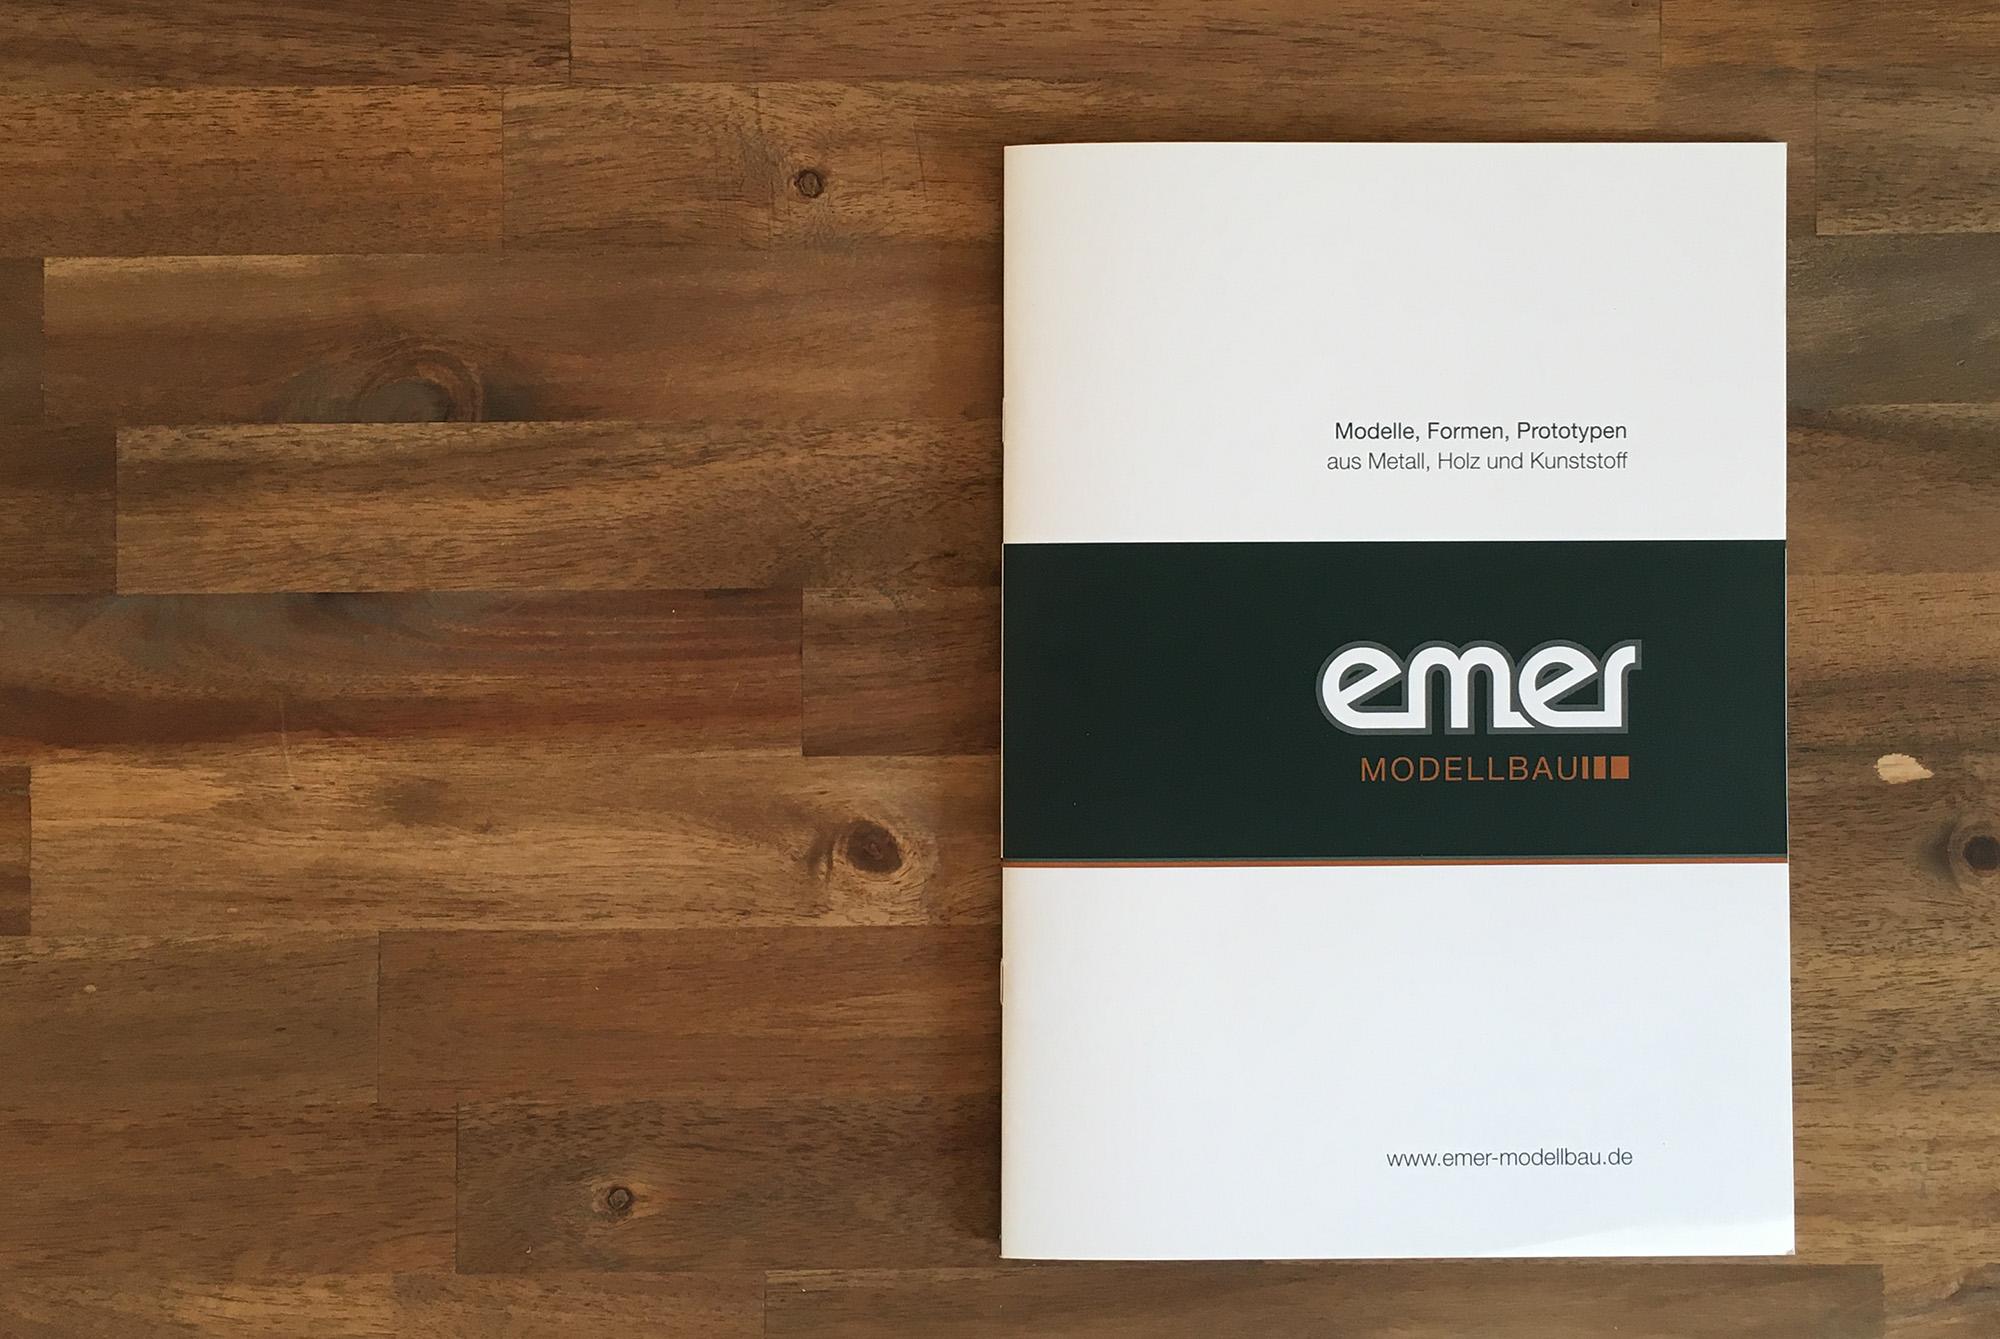 emer-modellbau-unternehmensbroschuere-01-2016